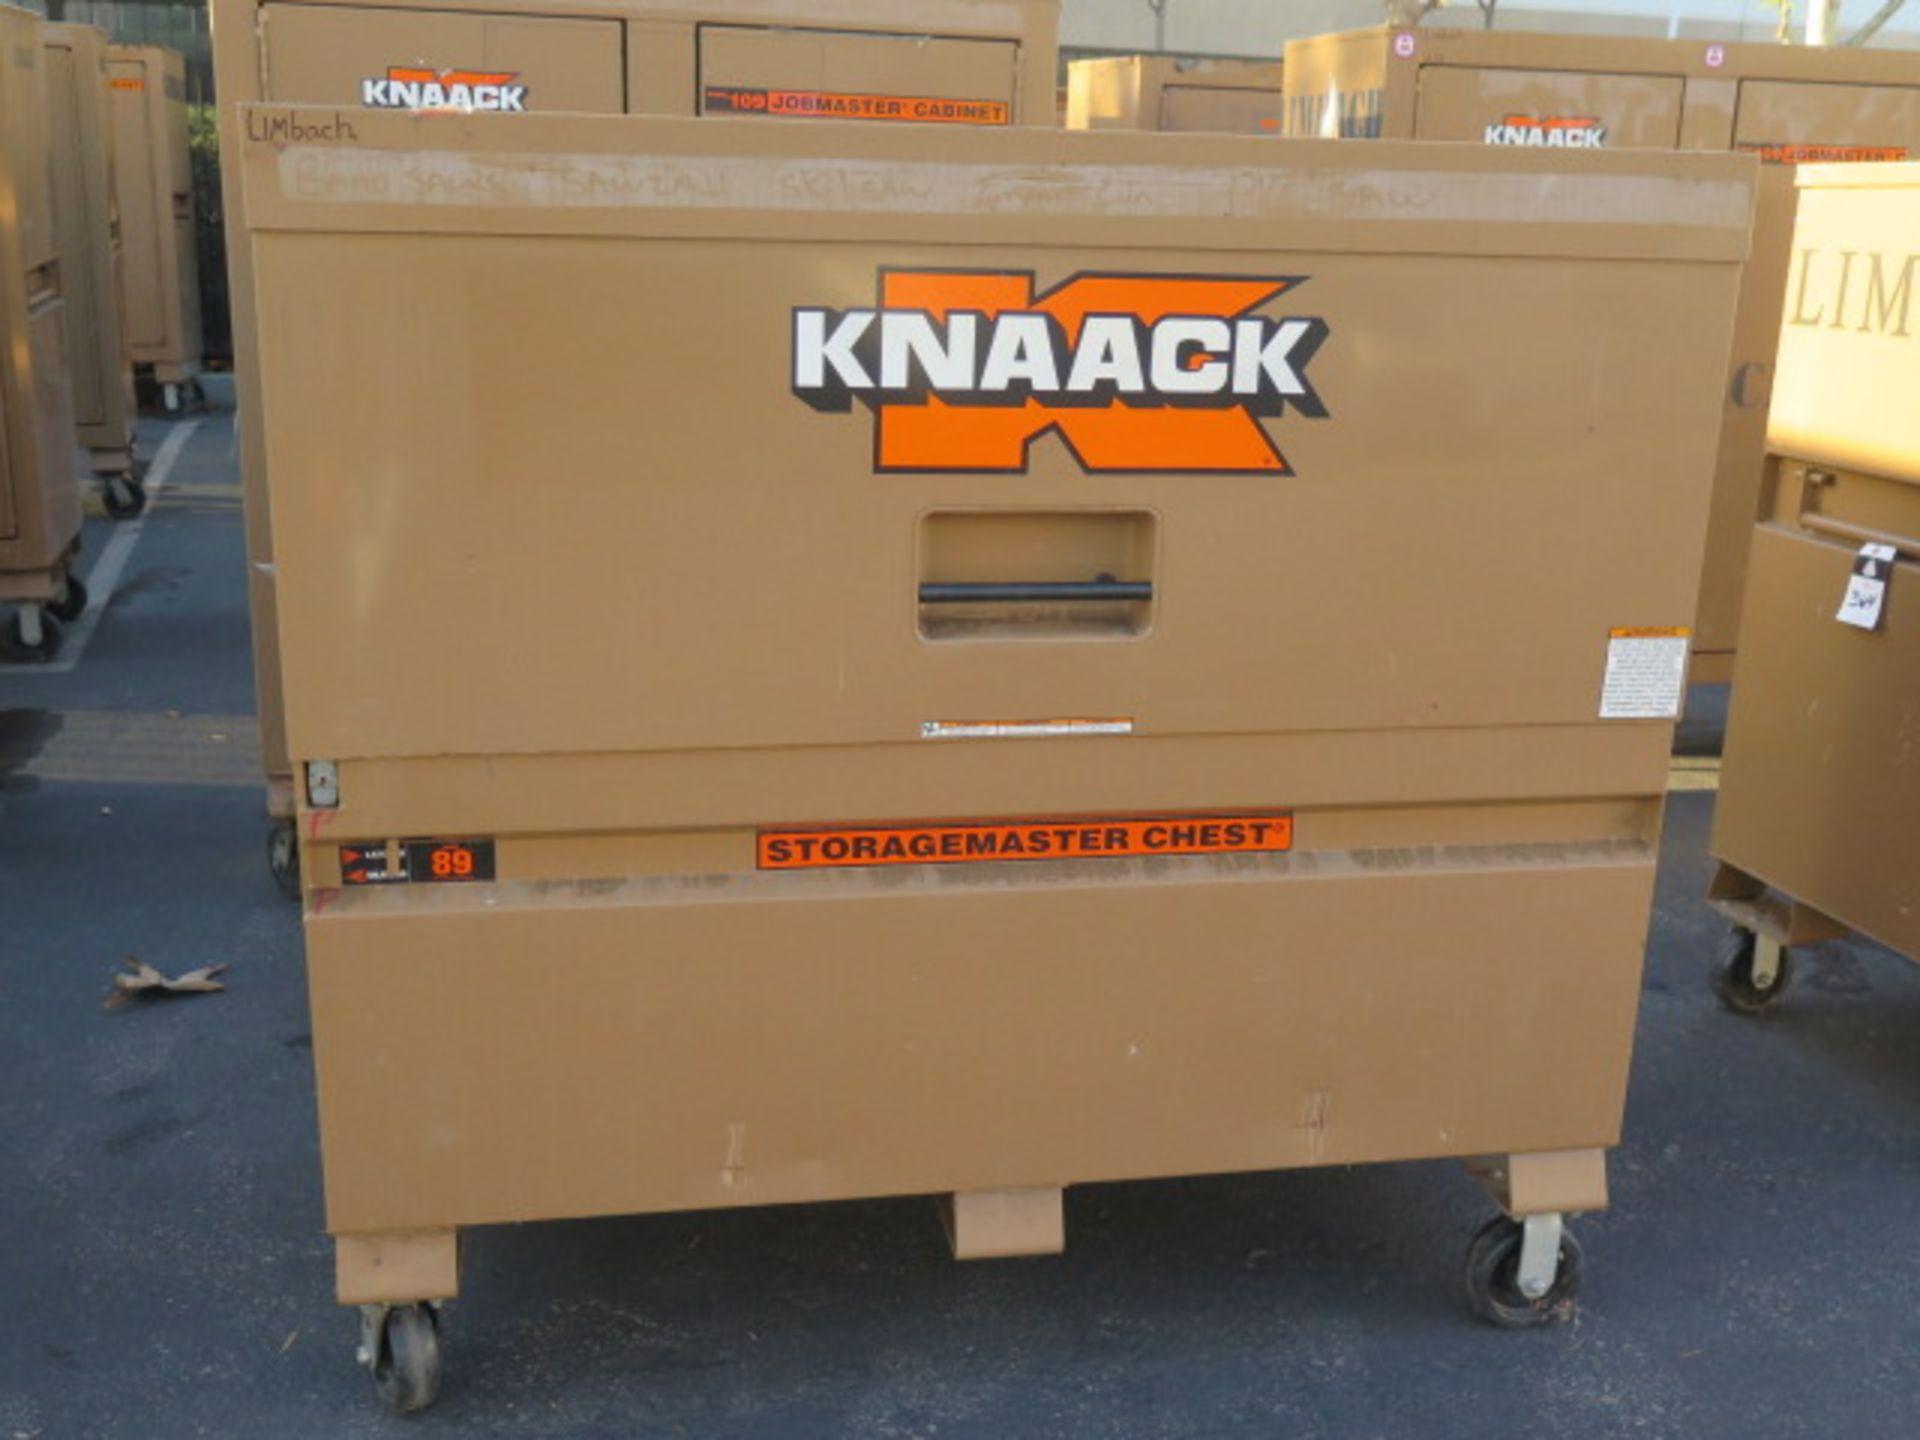 Knaack mdl. 89 Storagemaster Rolling Job Box (SOLD AS-IS - NO WARRANTY)